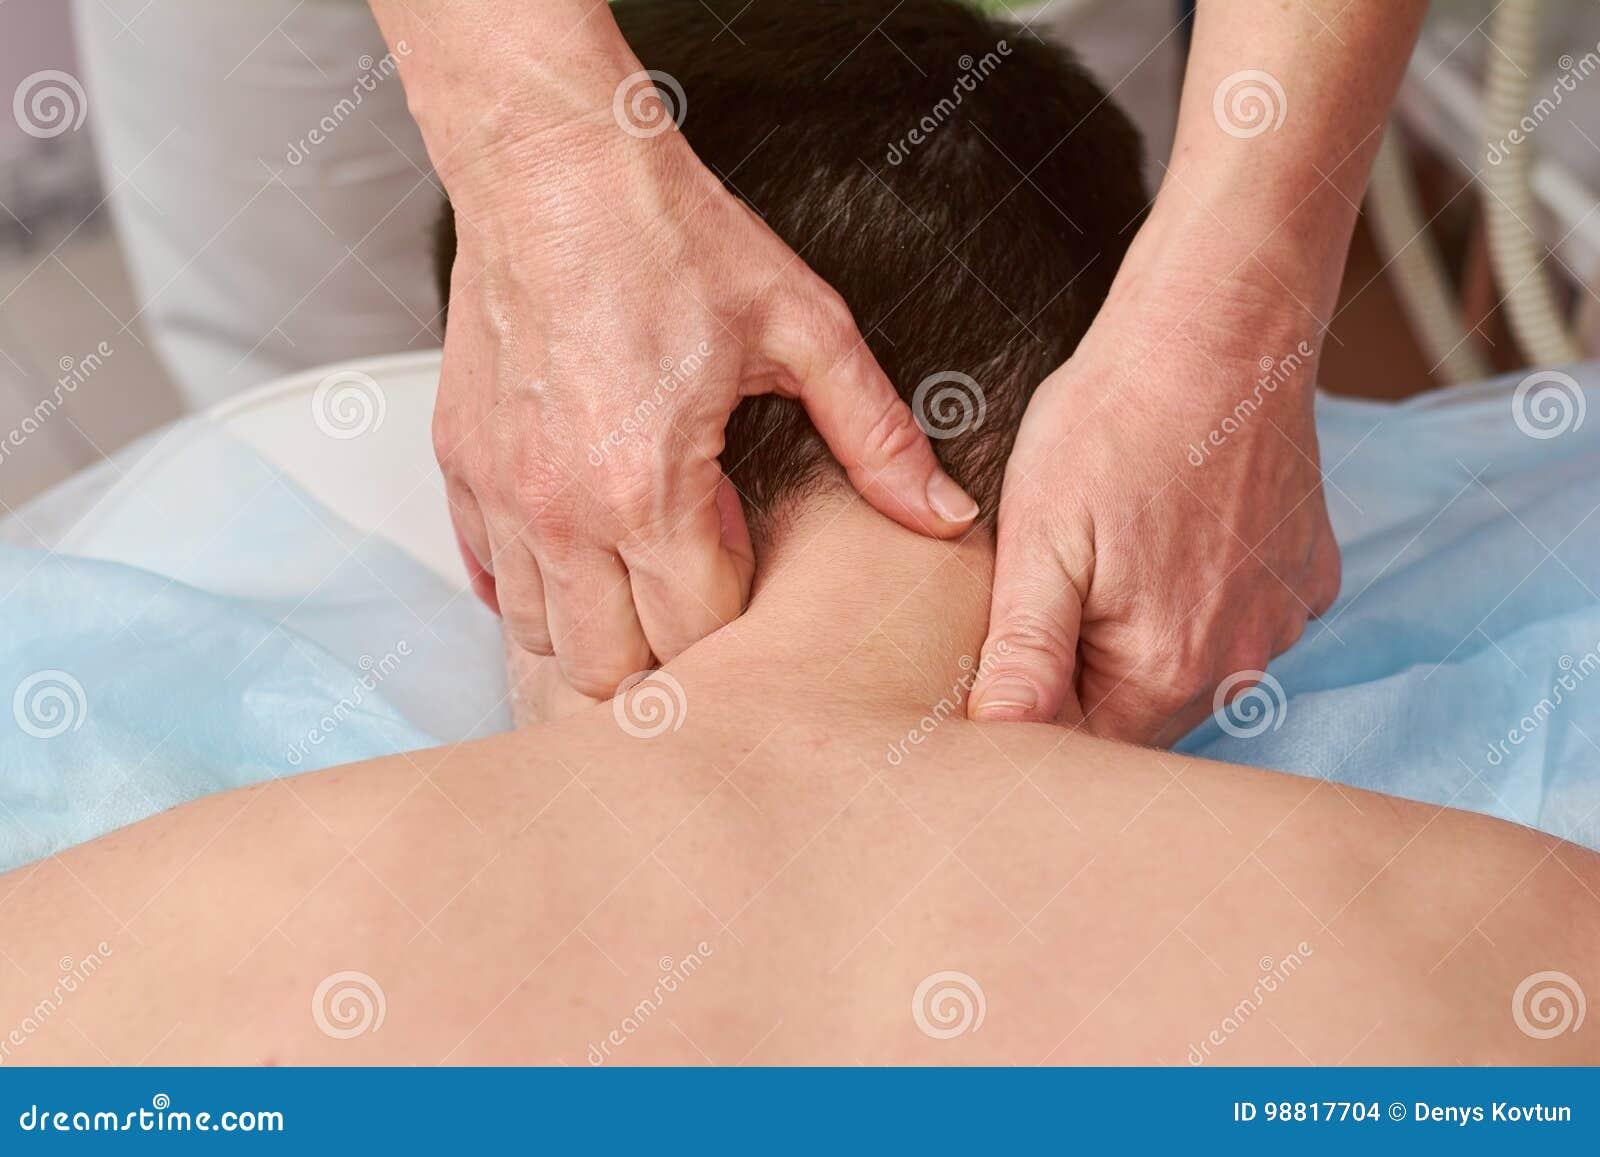 Neck massage close up.